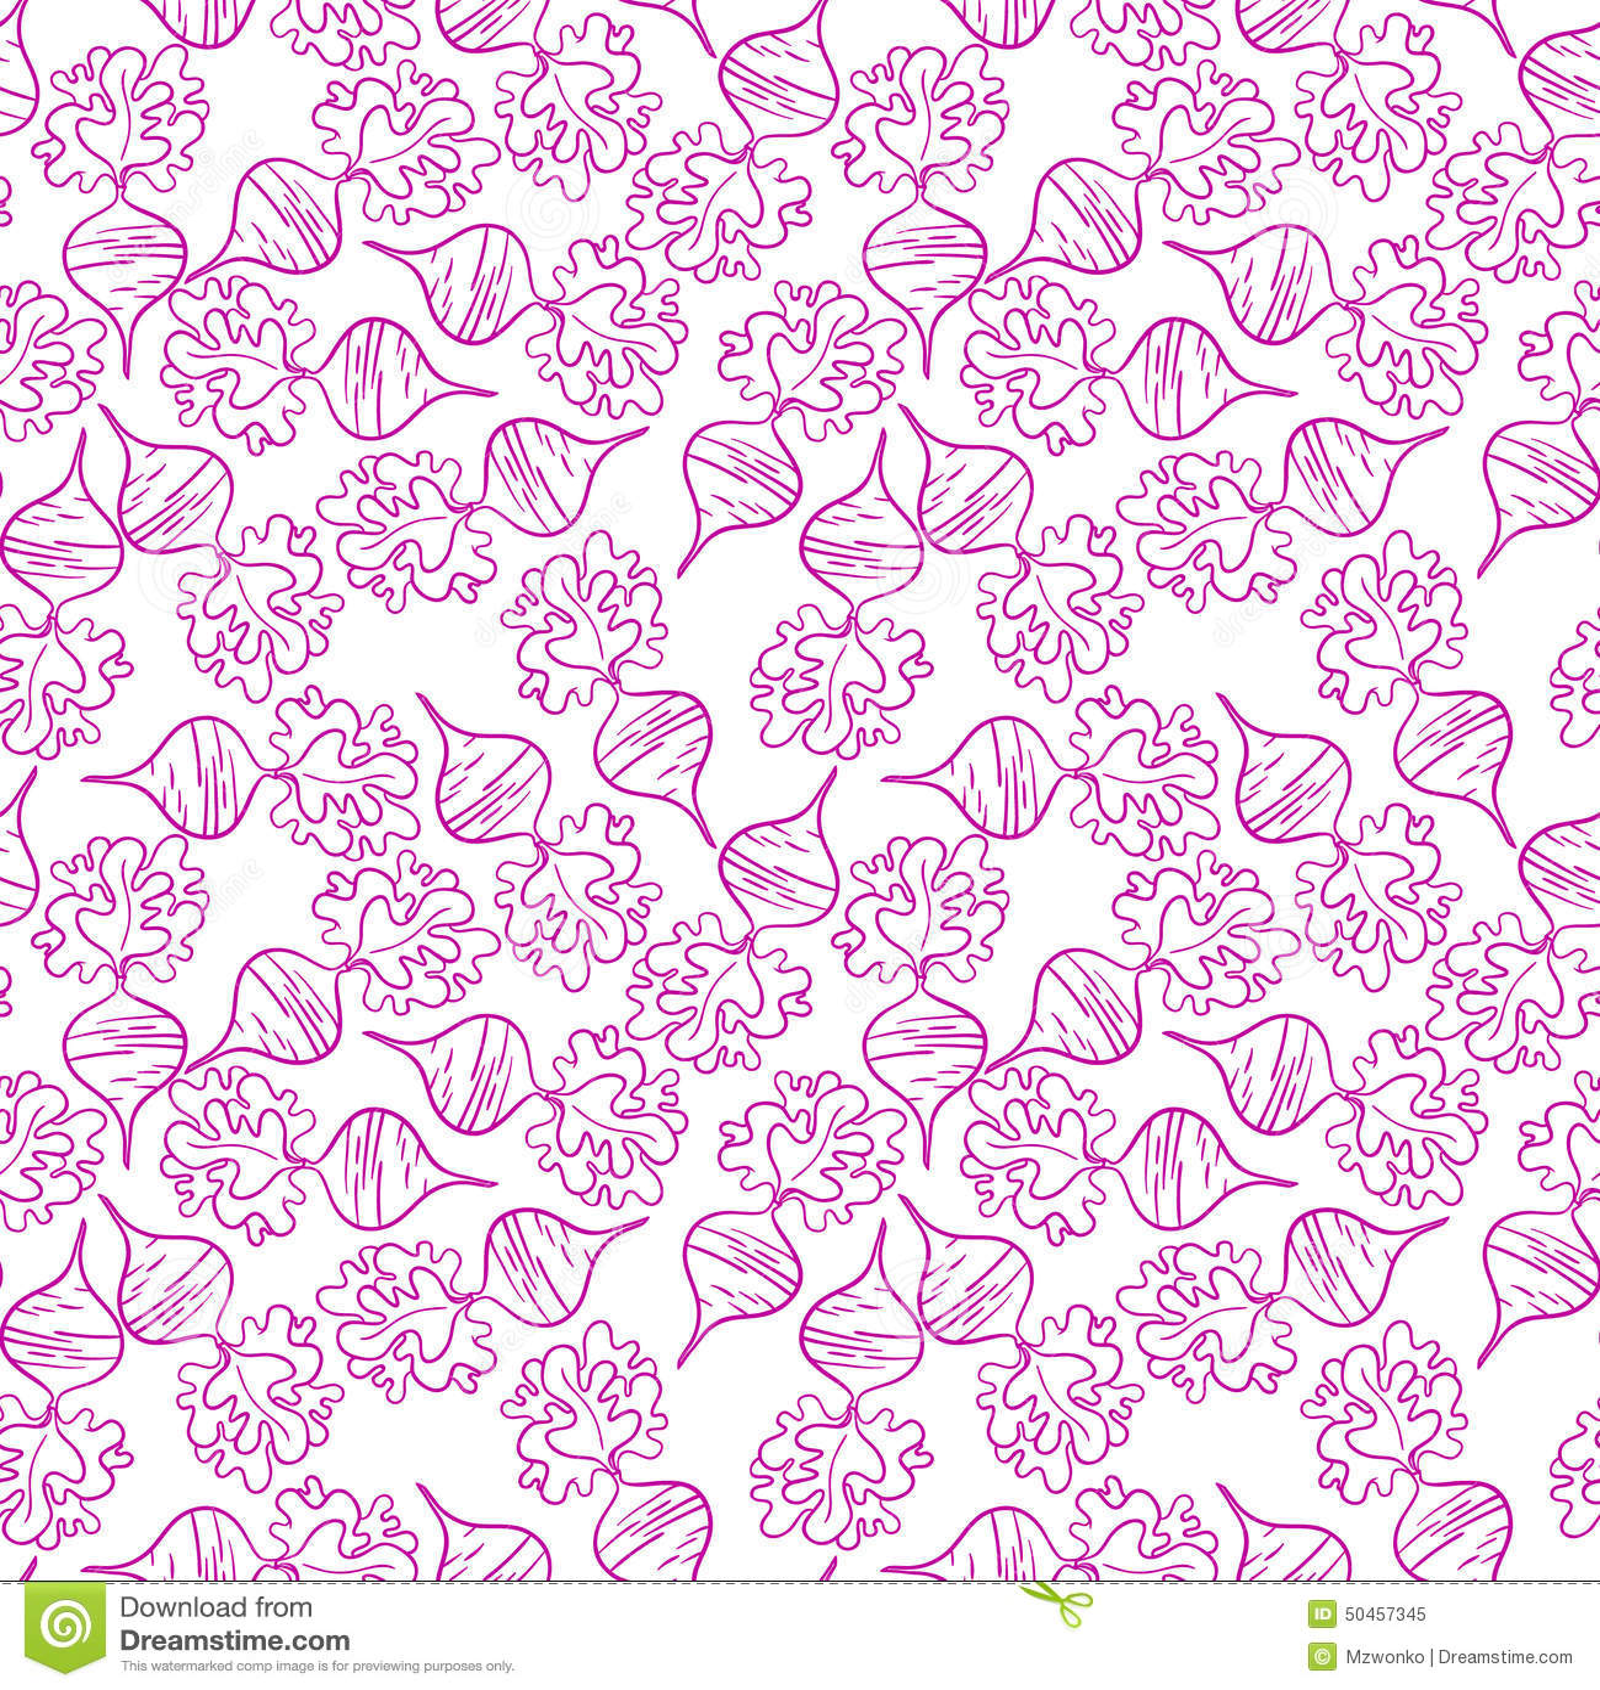 Radish pattern. Beetroot